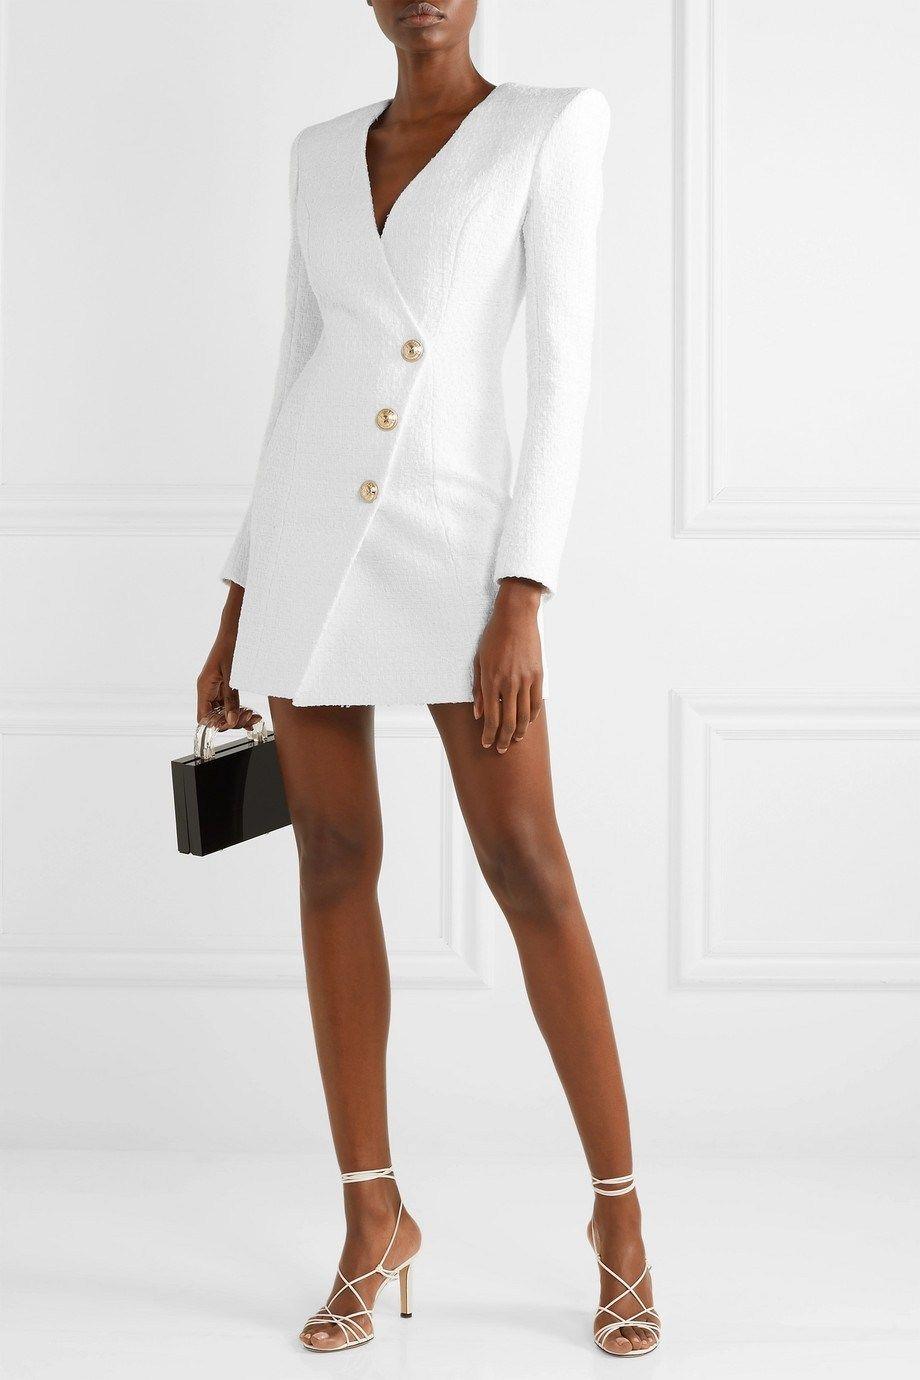 Top 10 Short Wedding Dresses Bridal Musings Wedding Blog Fashion Little White Dresses Mini Dress [ 1380 x 920 Pixel ]